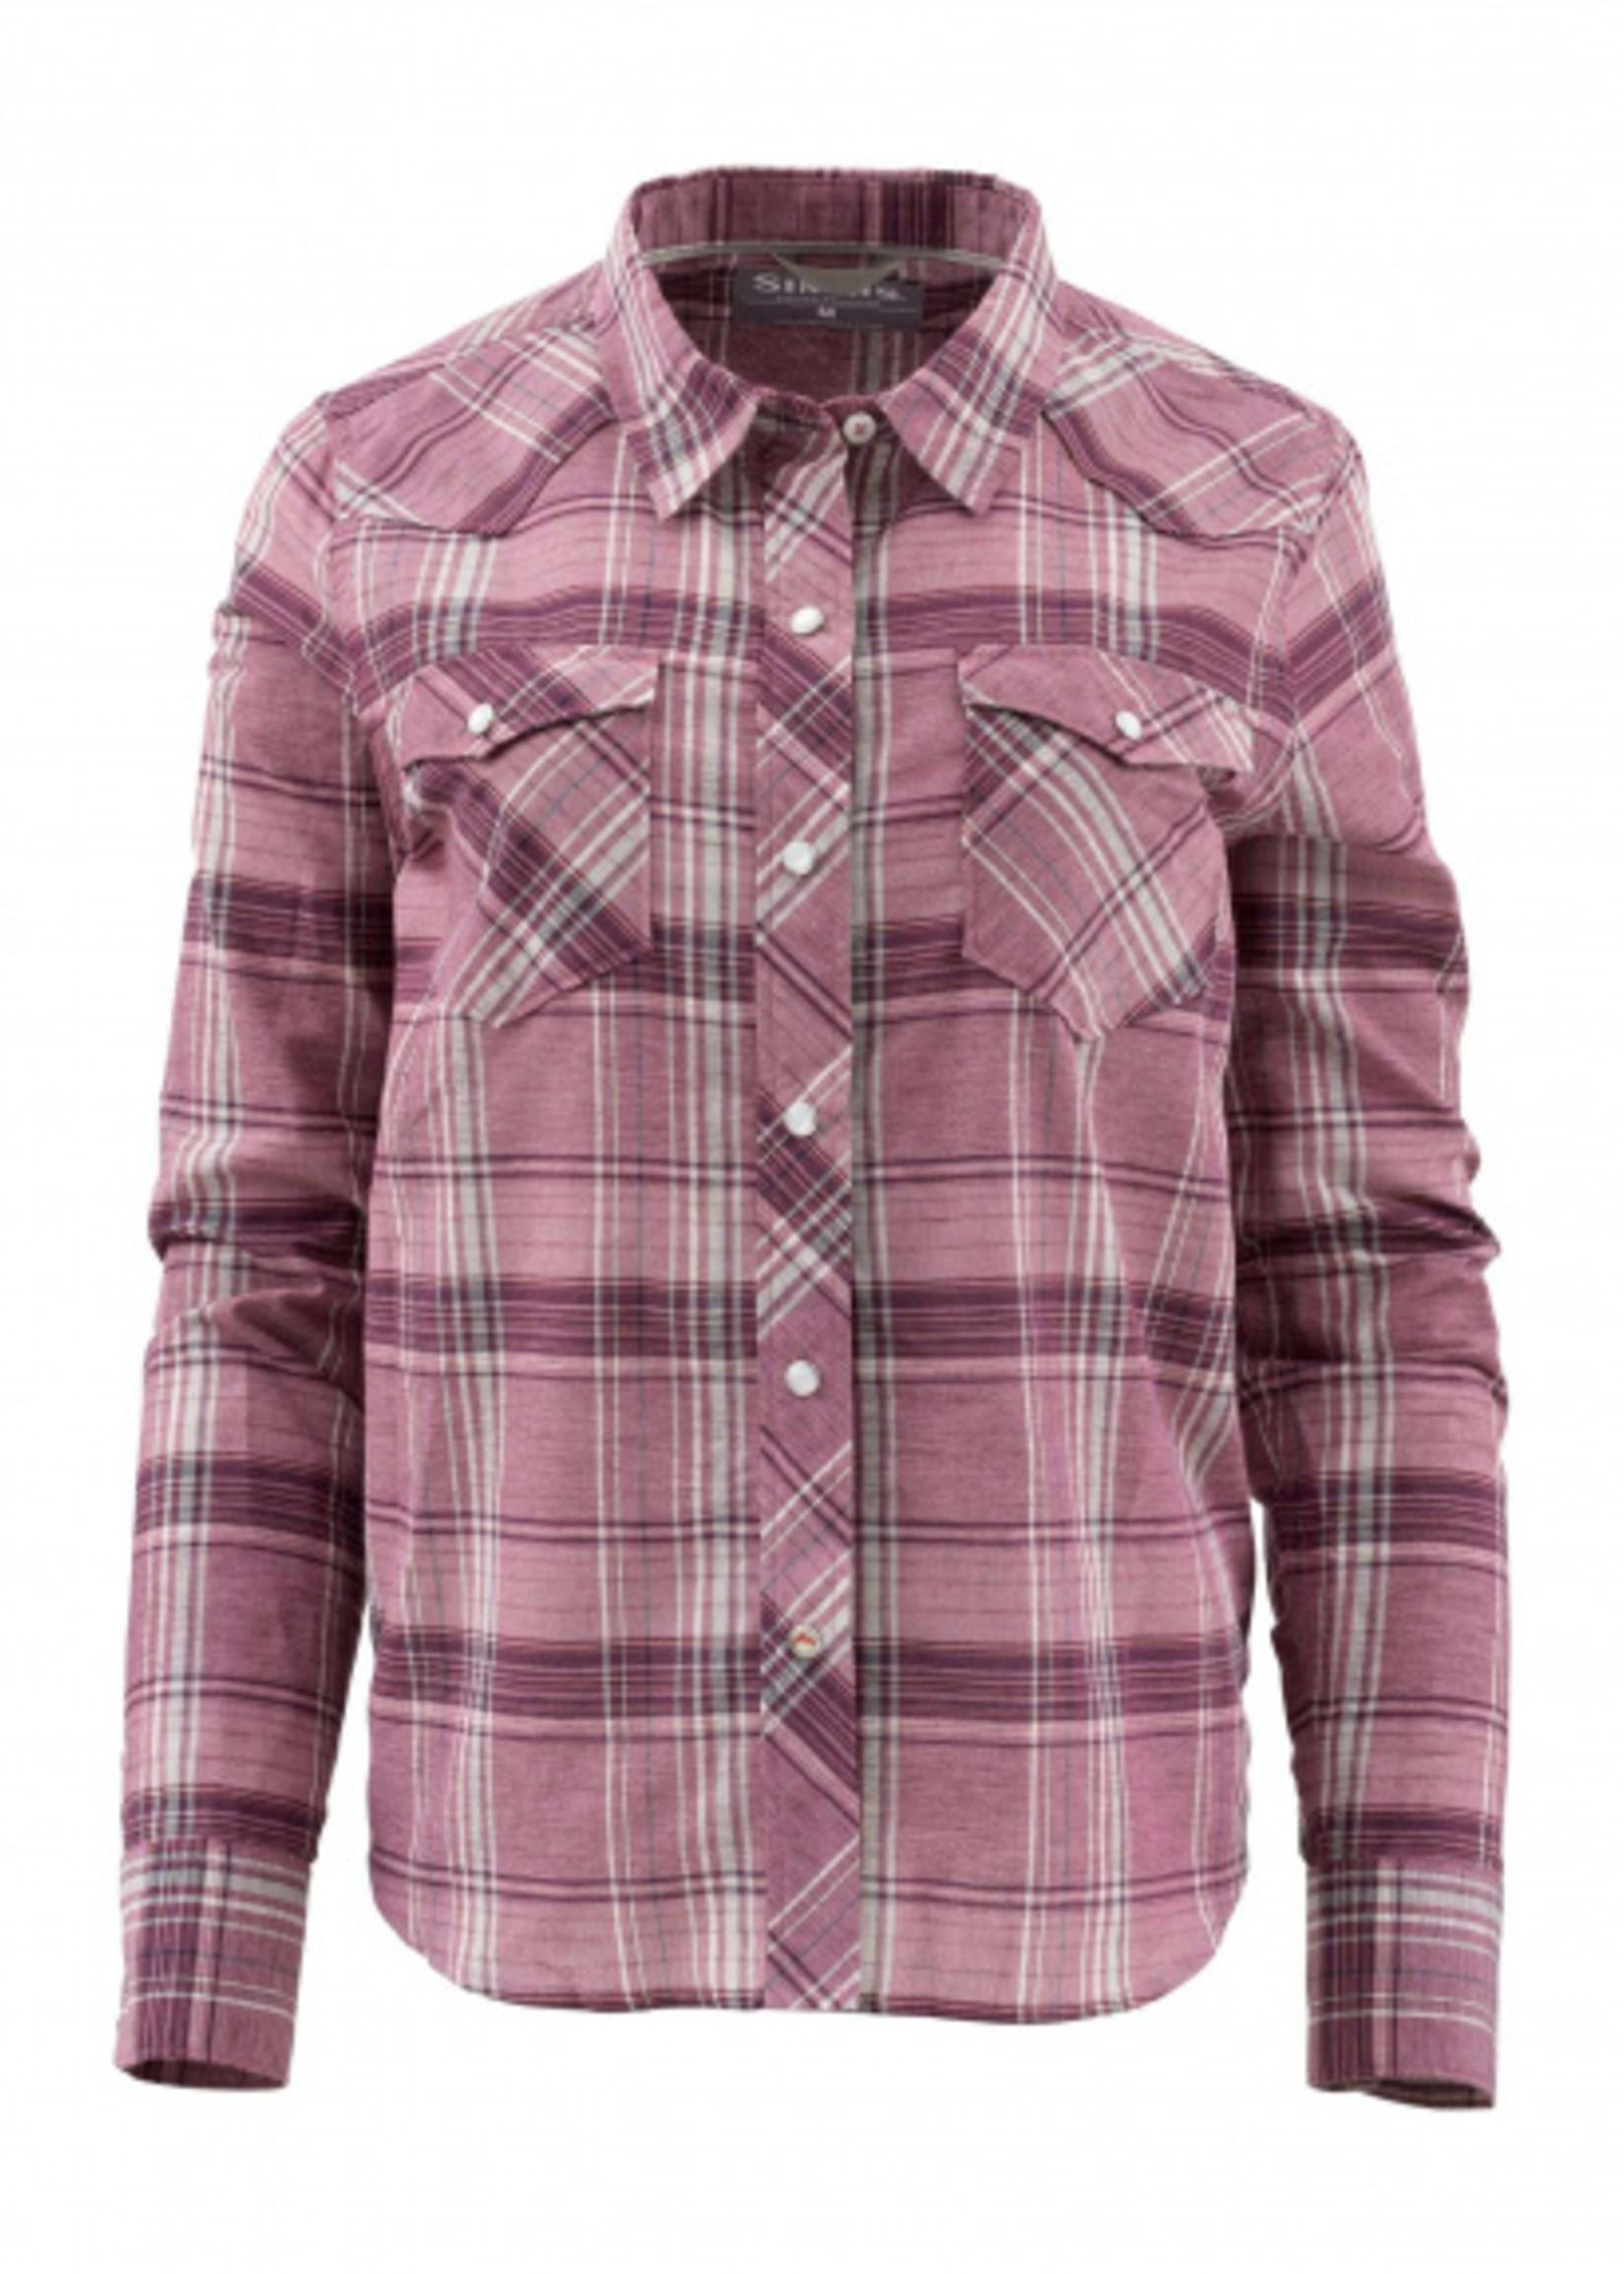 SIMMS Women's Ruby River LS Shirt